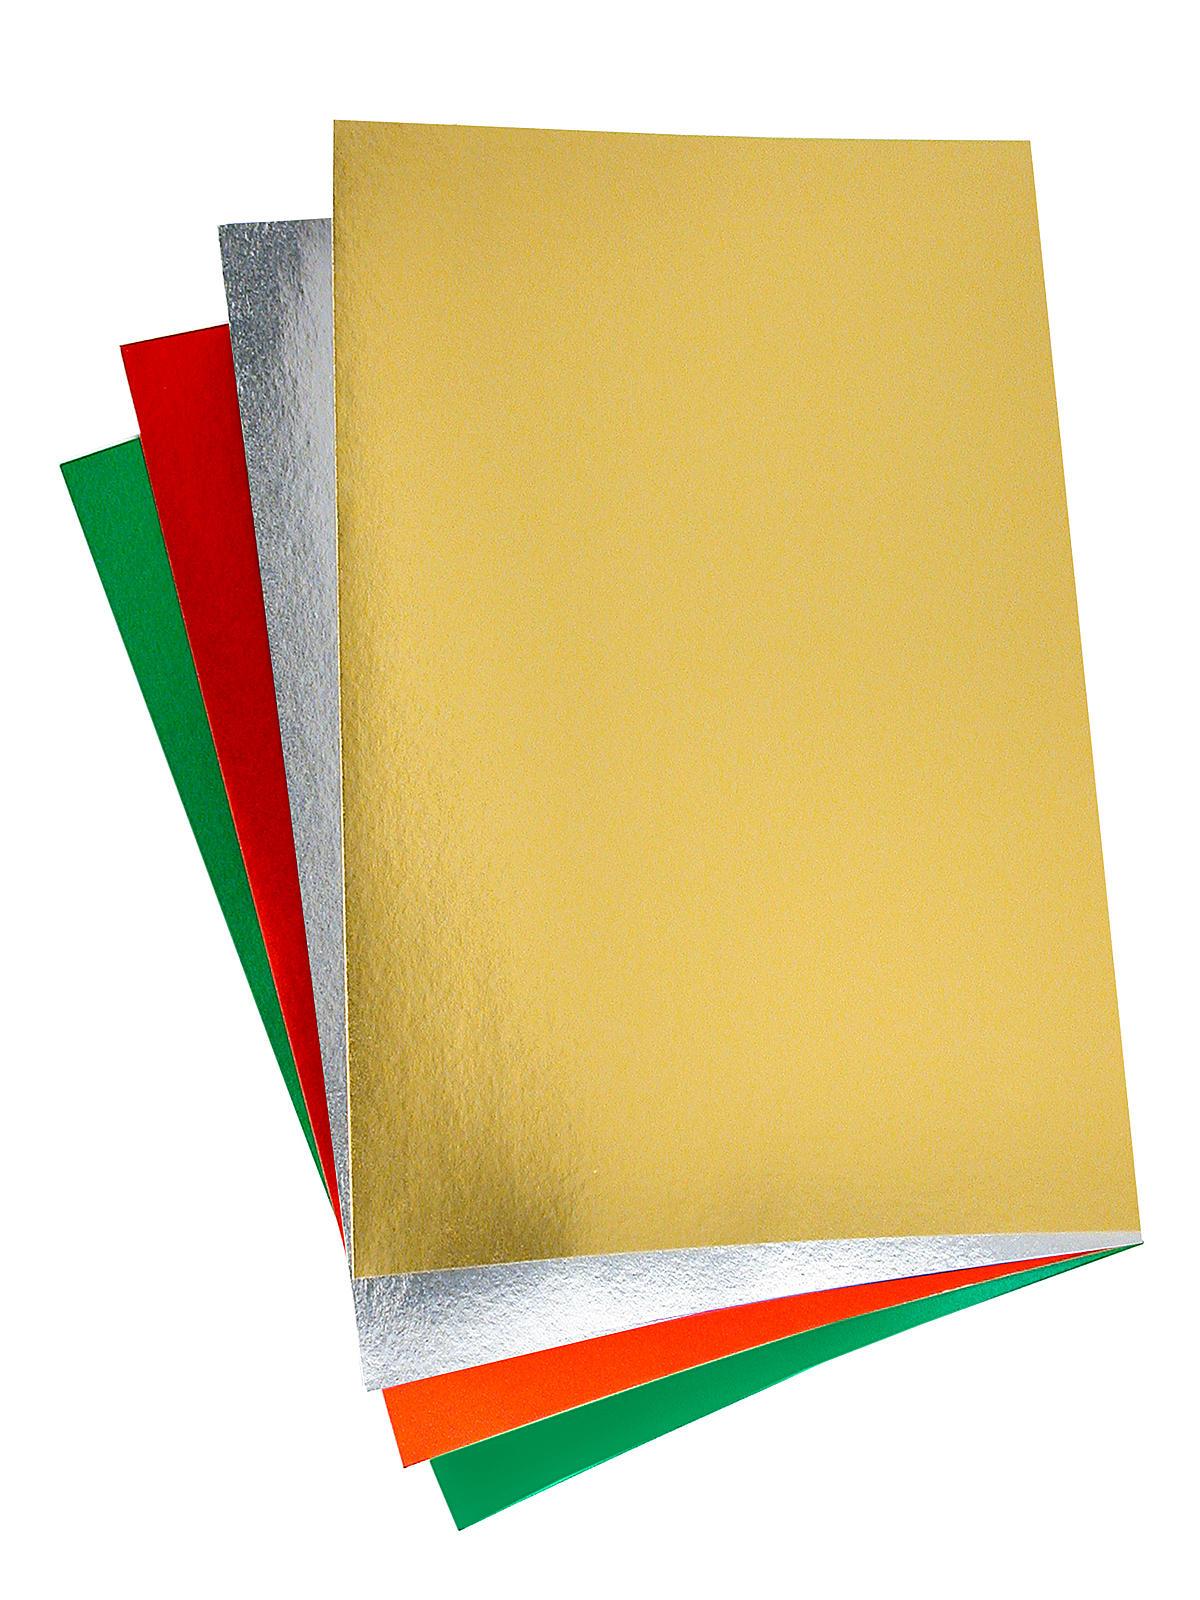 Pacon Metallic Foil Board | MisterArt.com